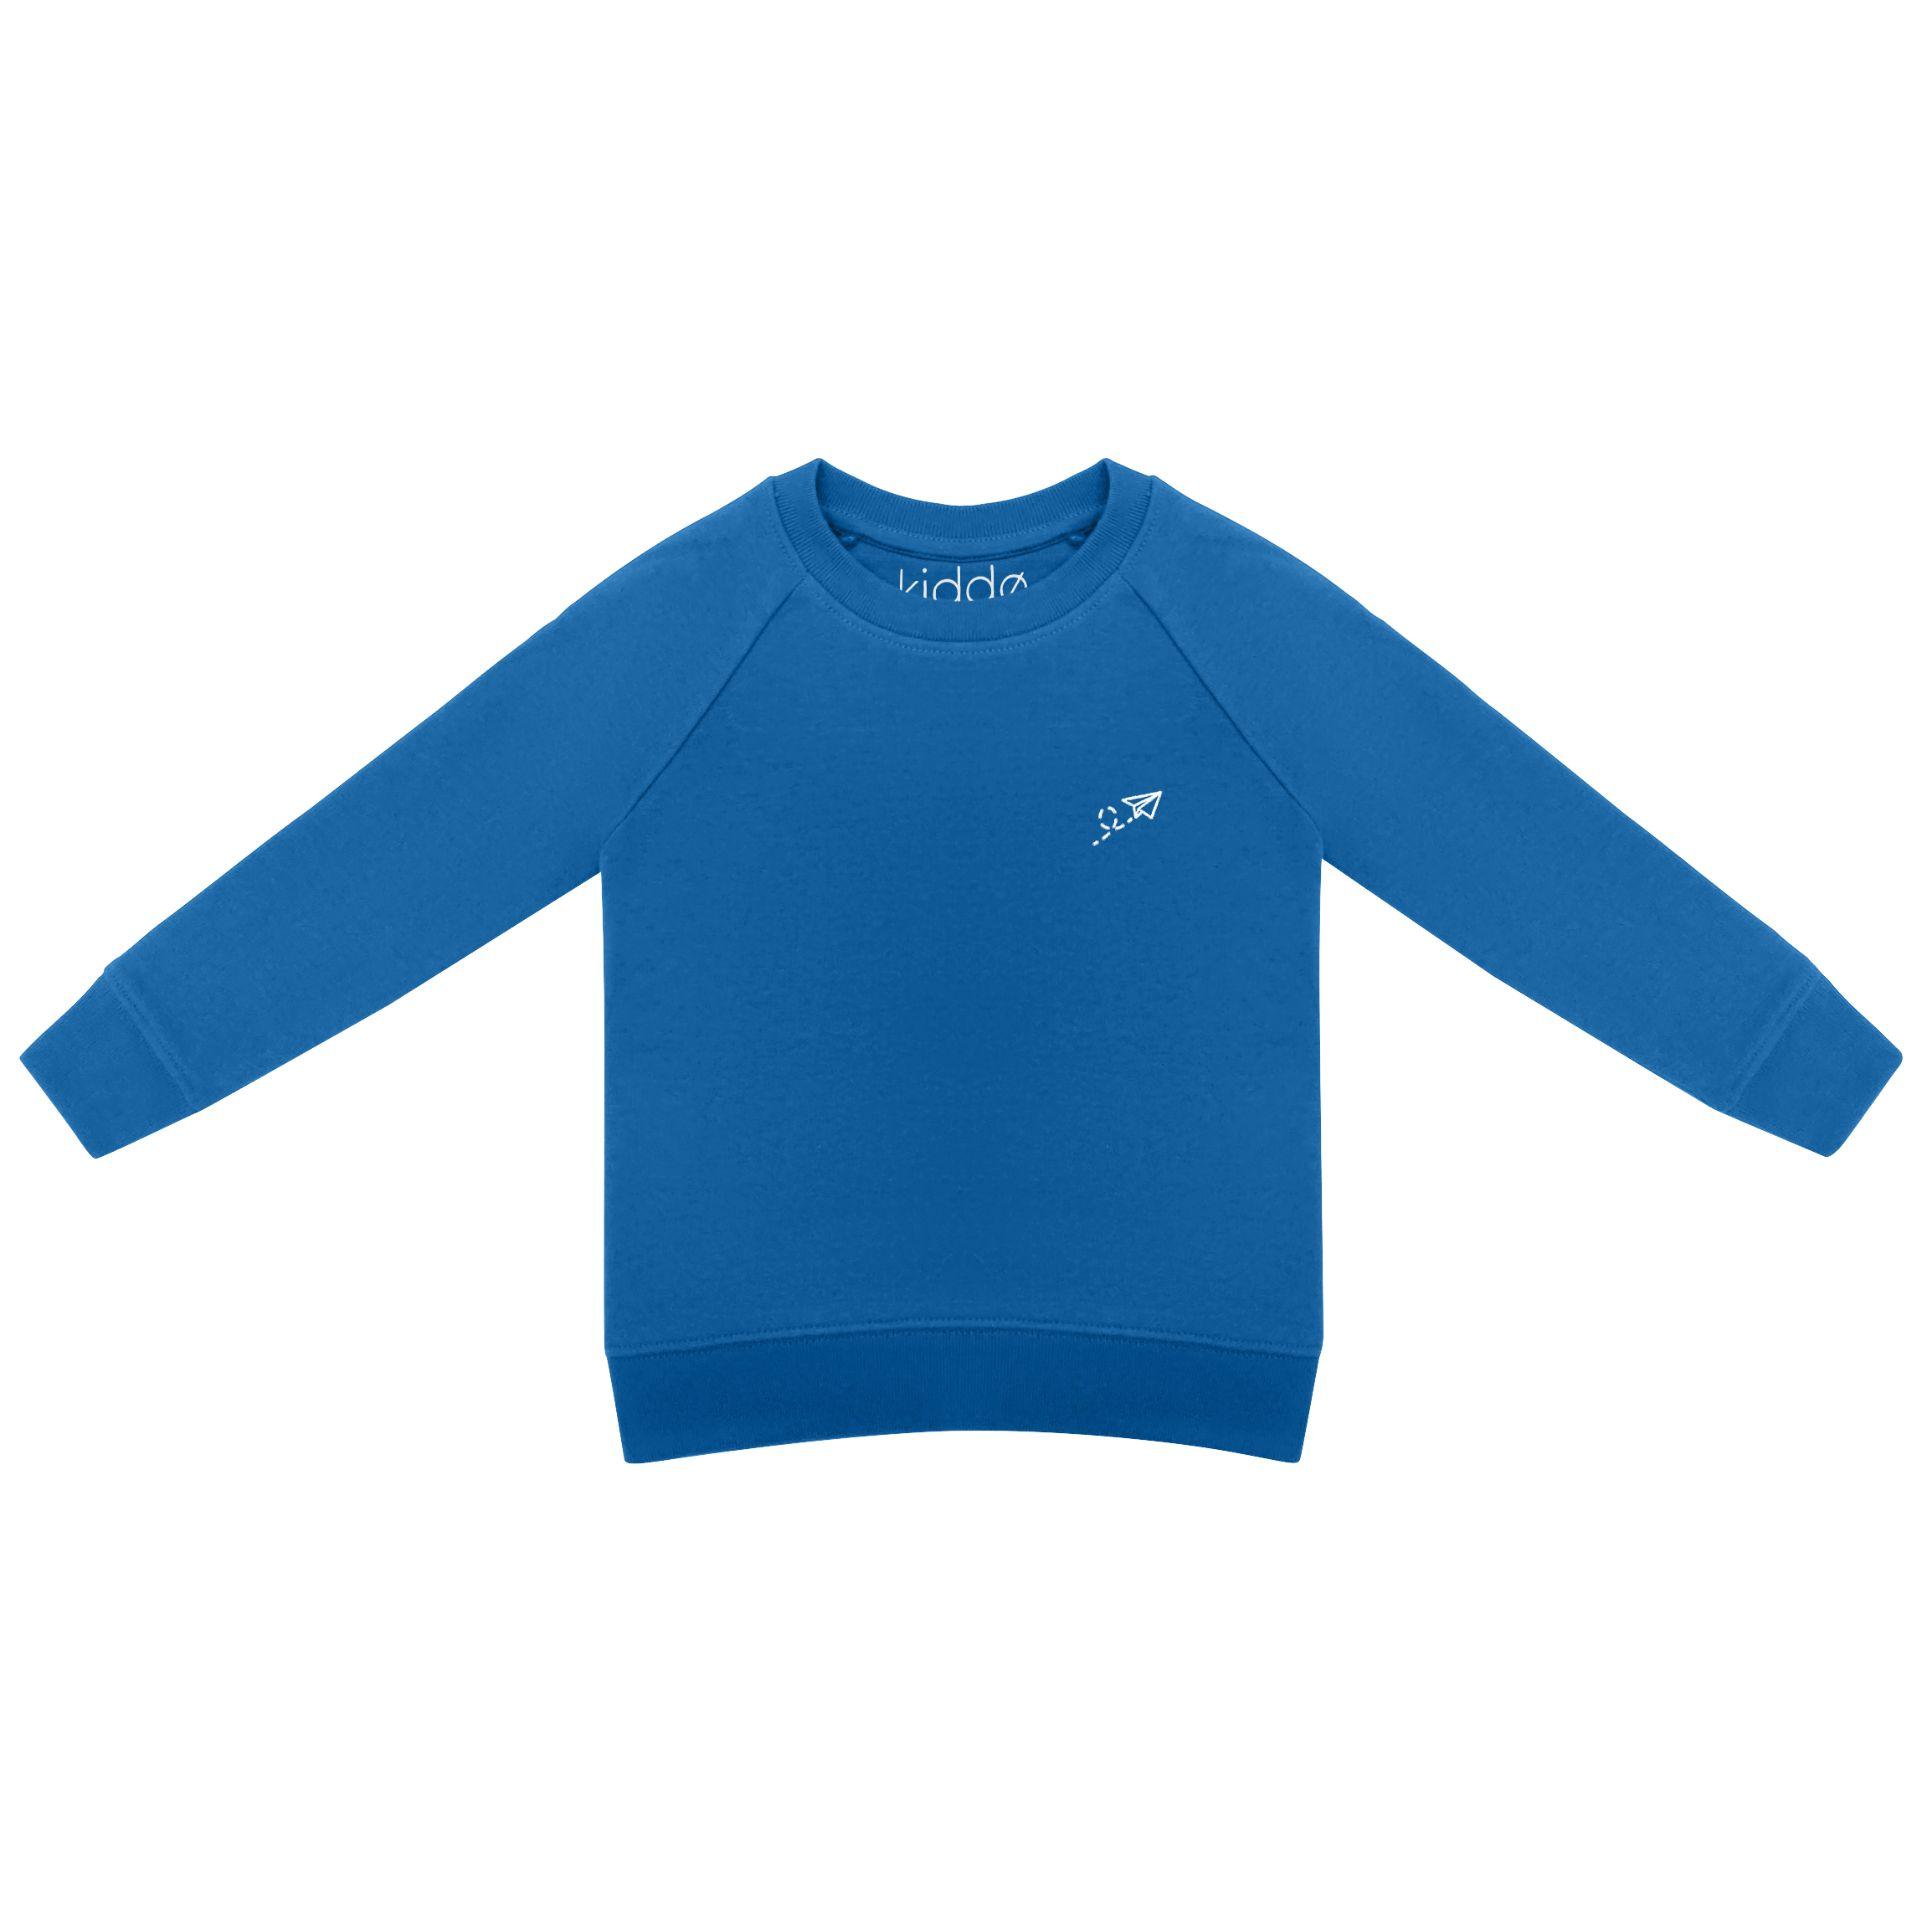 kiddø – plane – Sweater